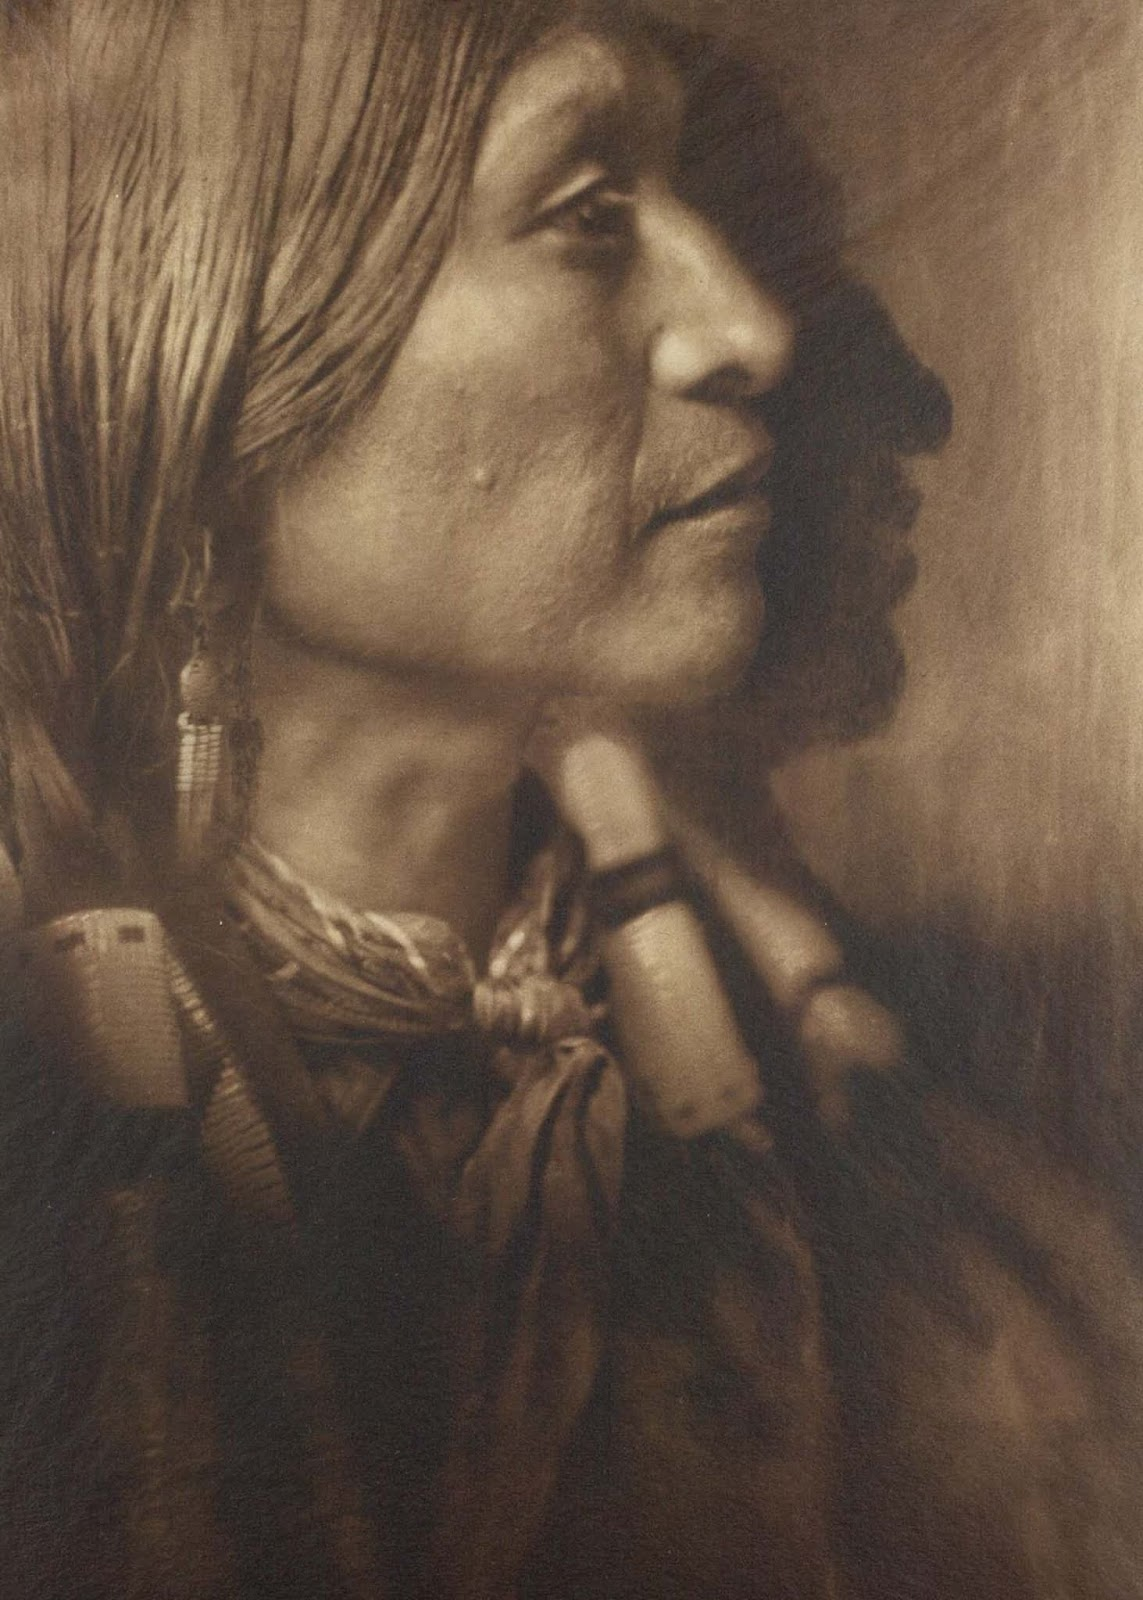 Vash Gon, a Jicarrilla man. 1910.